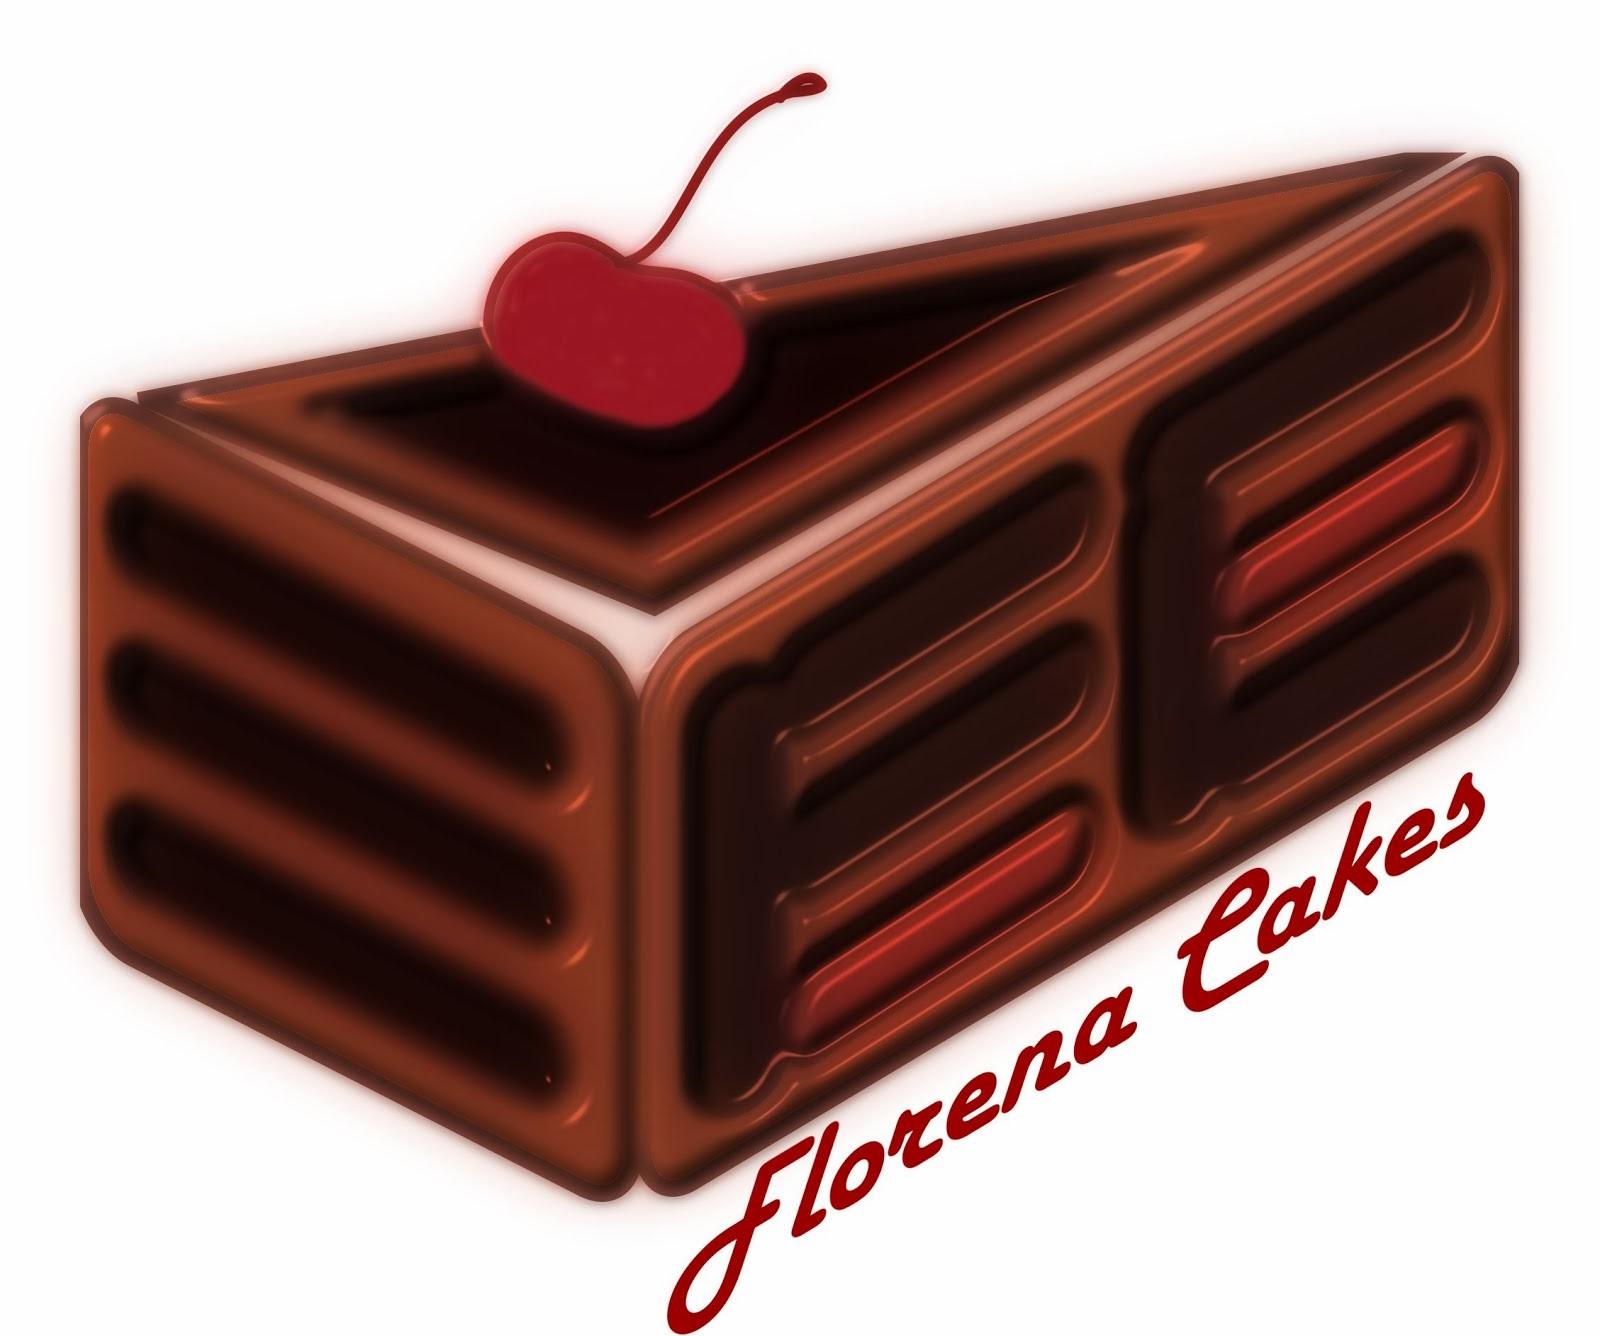 Florena's Cakes